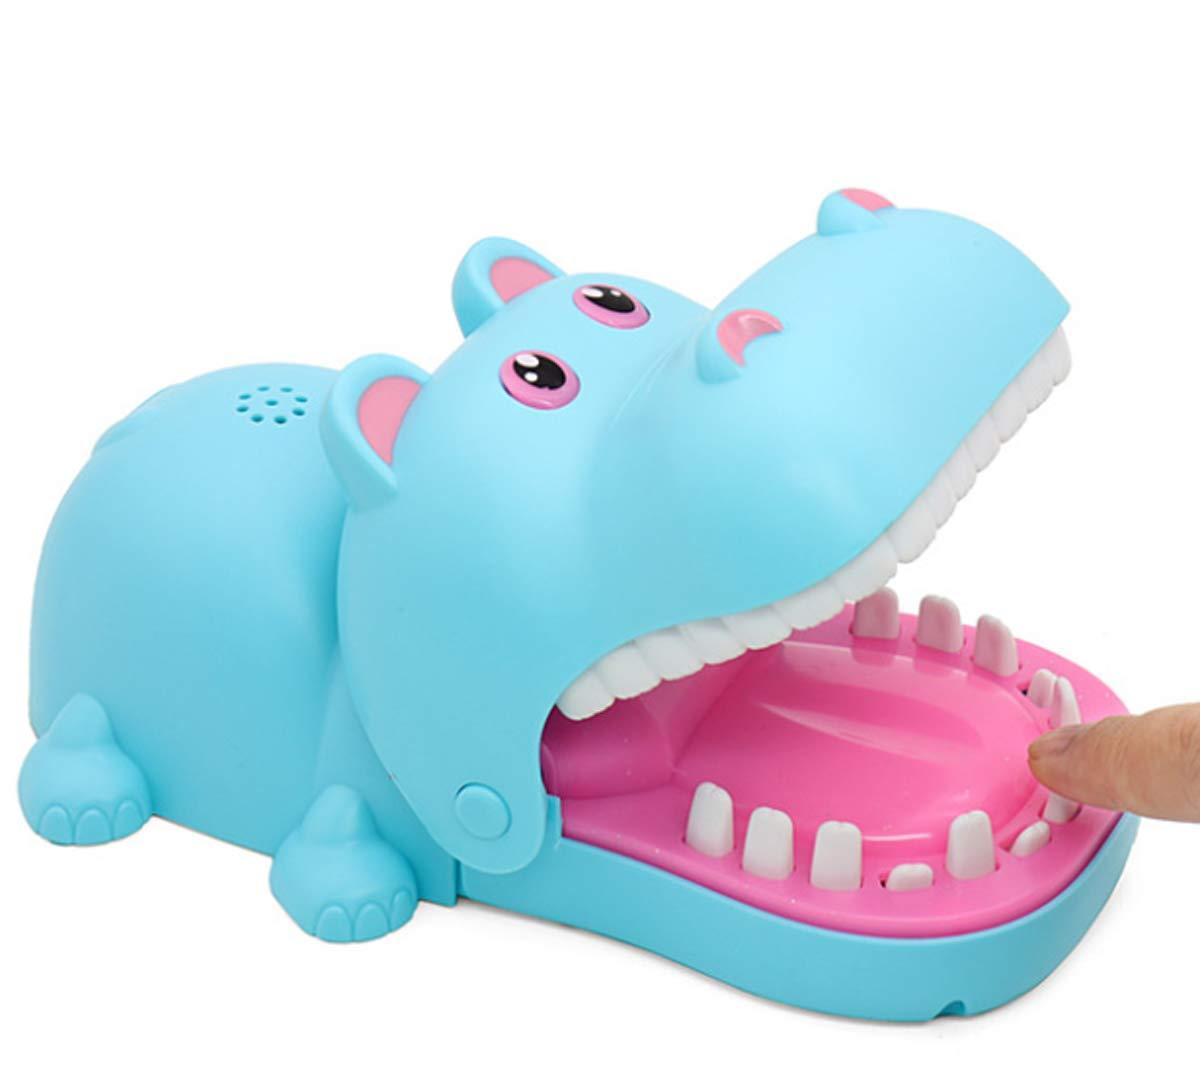 Practical Jokes Hippo Dentist Biting Finger Fun Games Funnier (Blue & Big Size) by Oun Nana